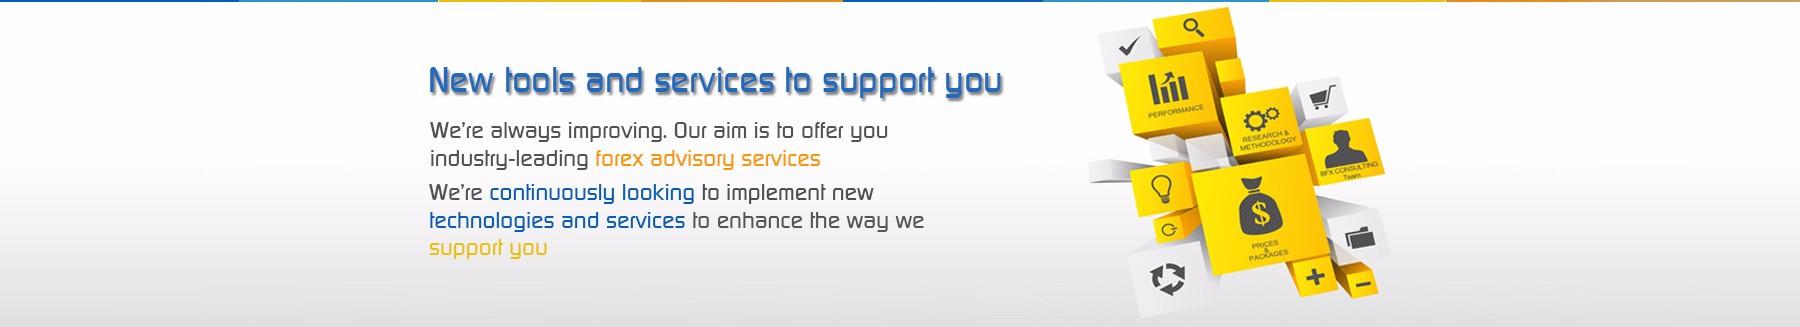 Forex advisory services